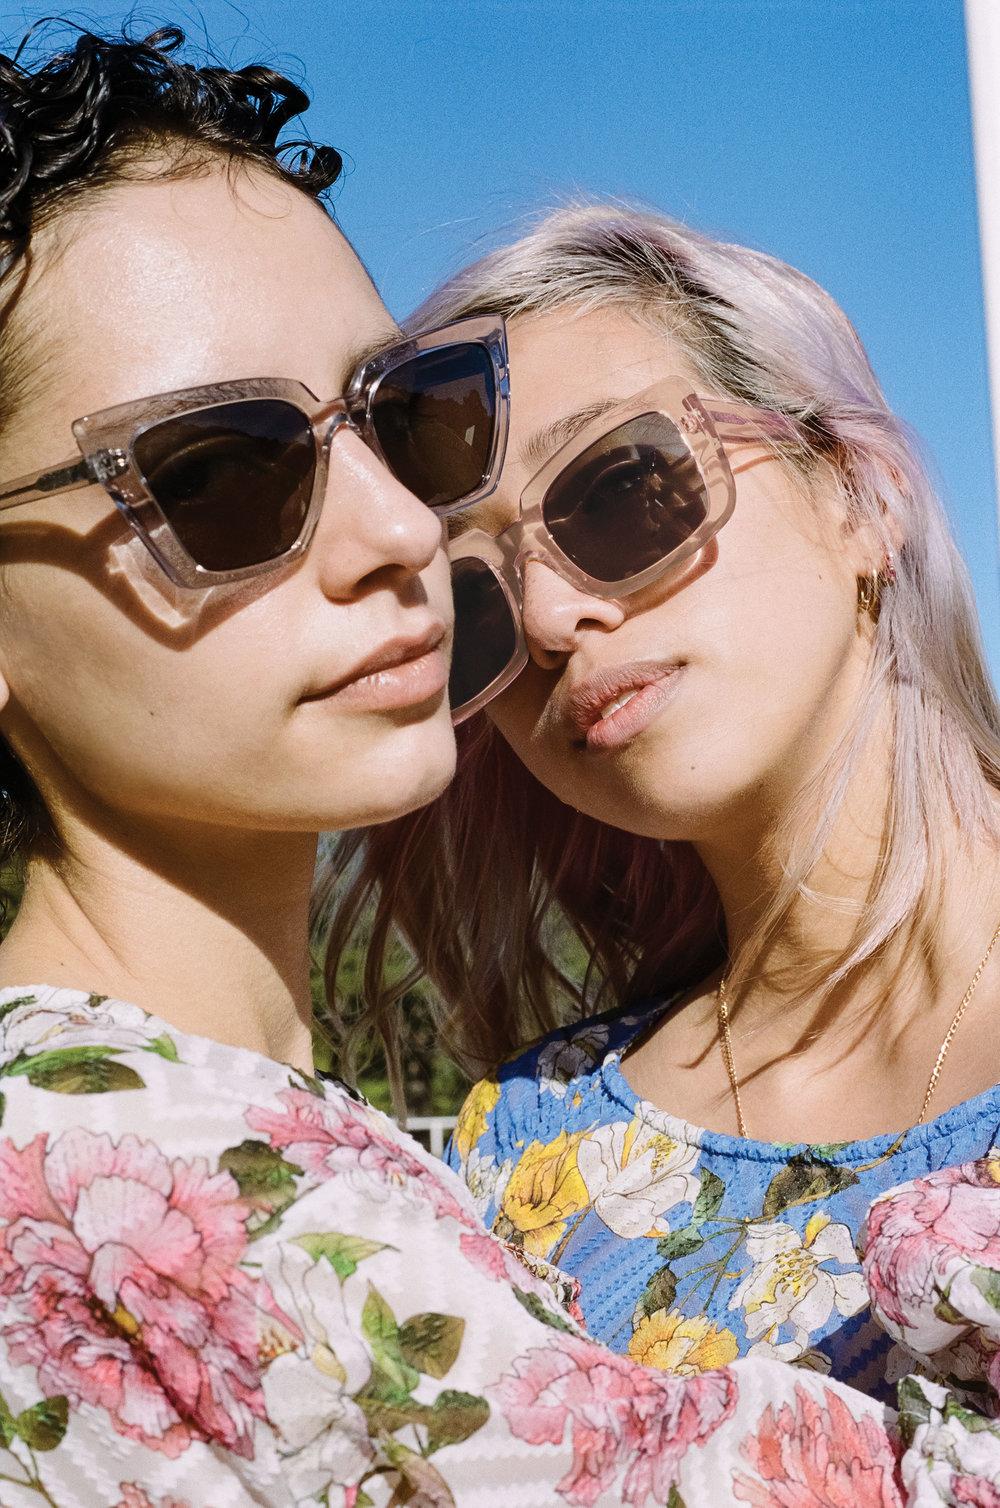 Maya wears Peggy frames, Rainy wears Dorian frames - campaign imagery, Chloe Hill.